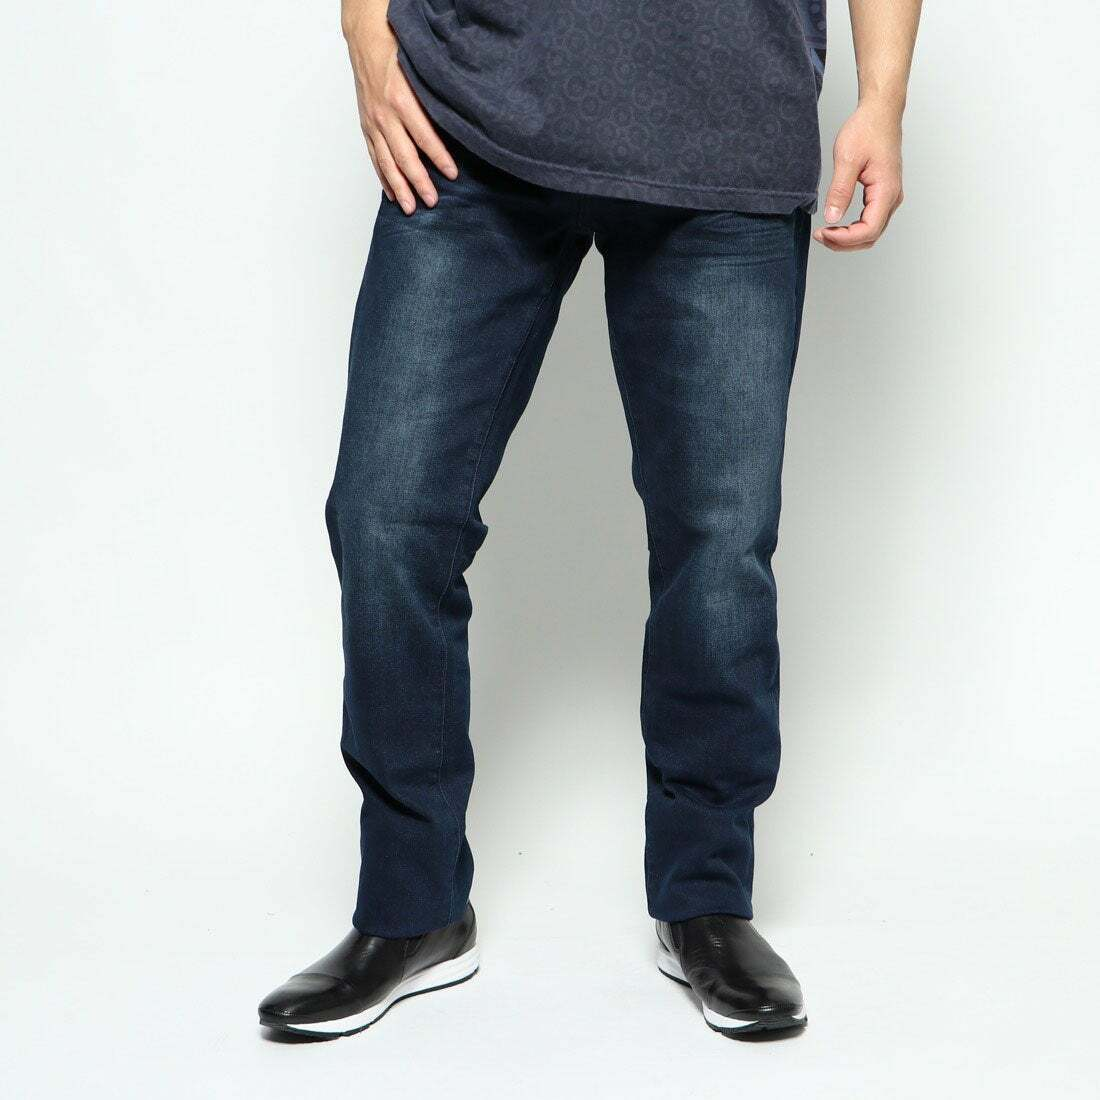 Desigual Denim Jon Rep Dunkelblau Herren Regular Fit Jeans Größe W32 L32